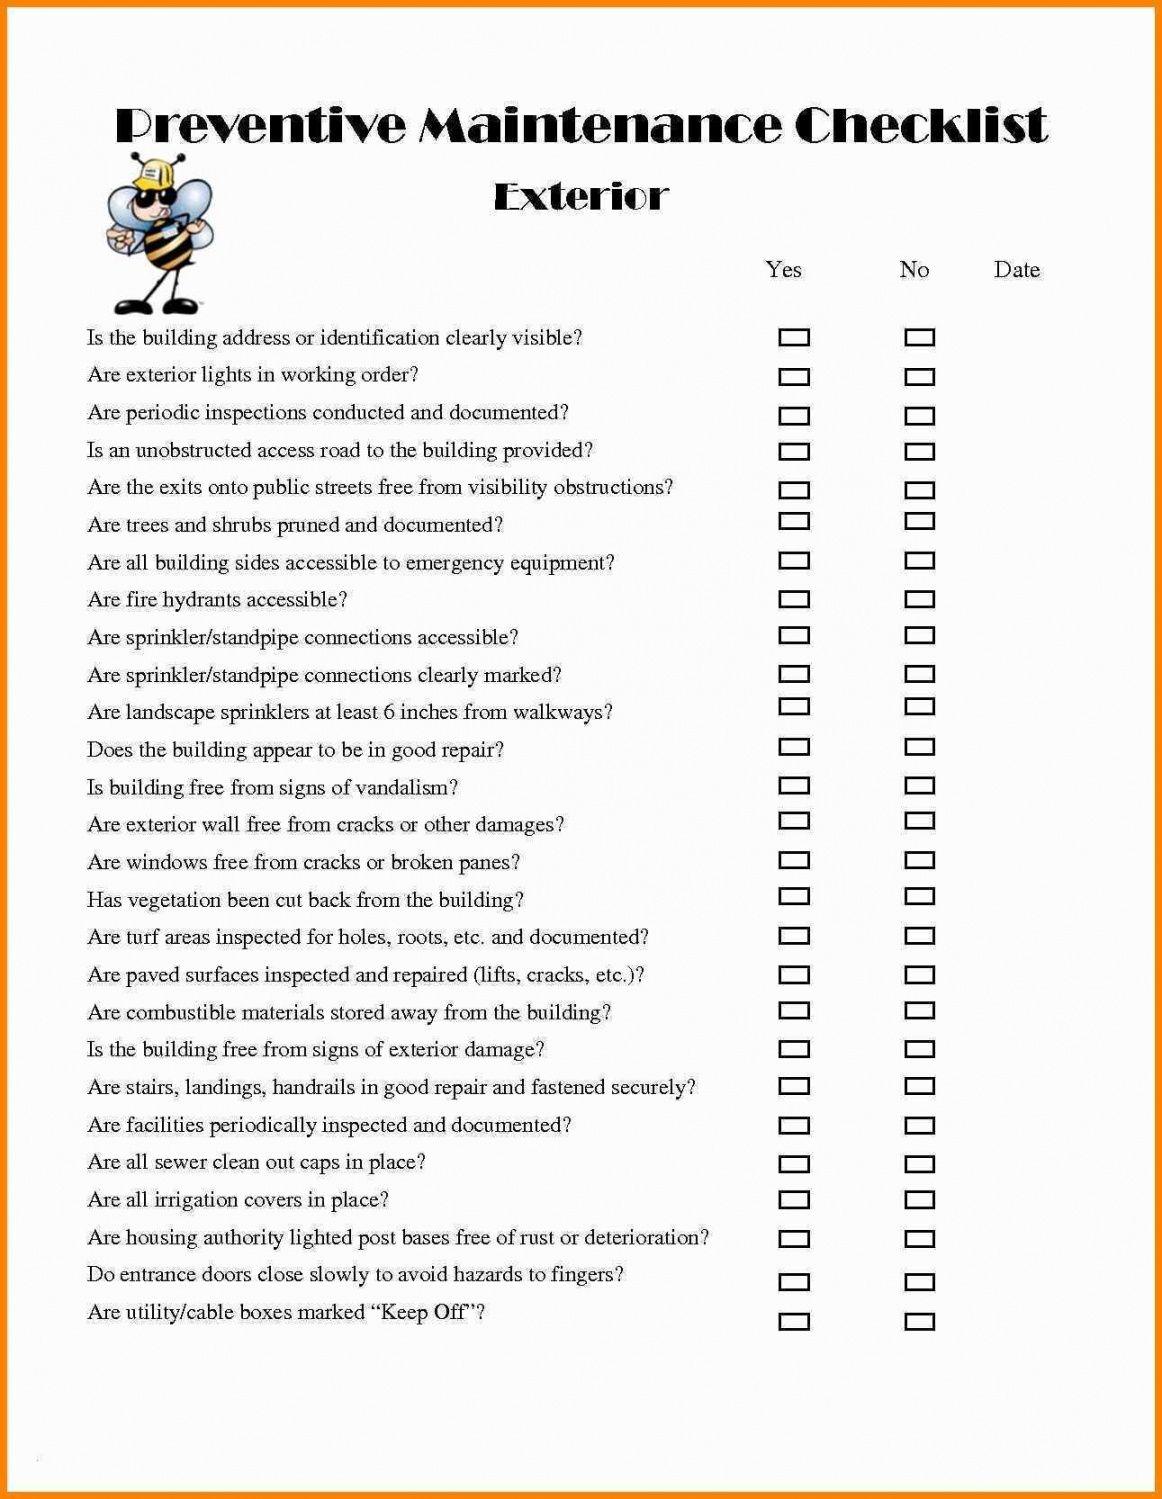 cnc machinist resume pdf